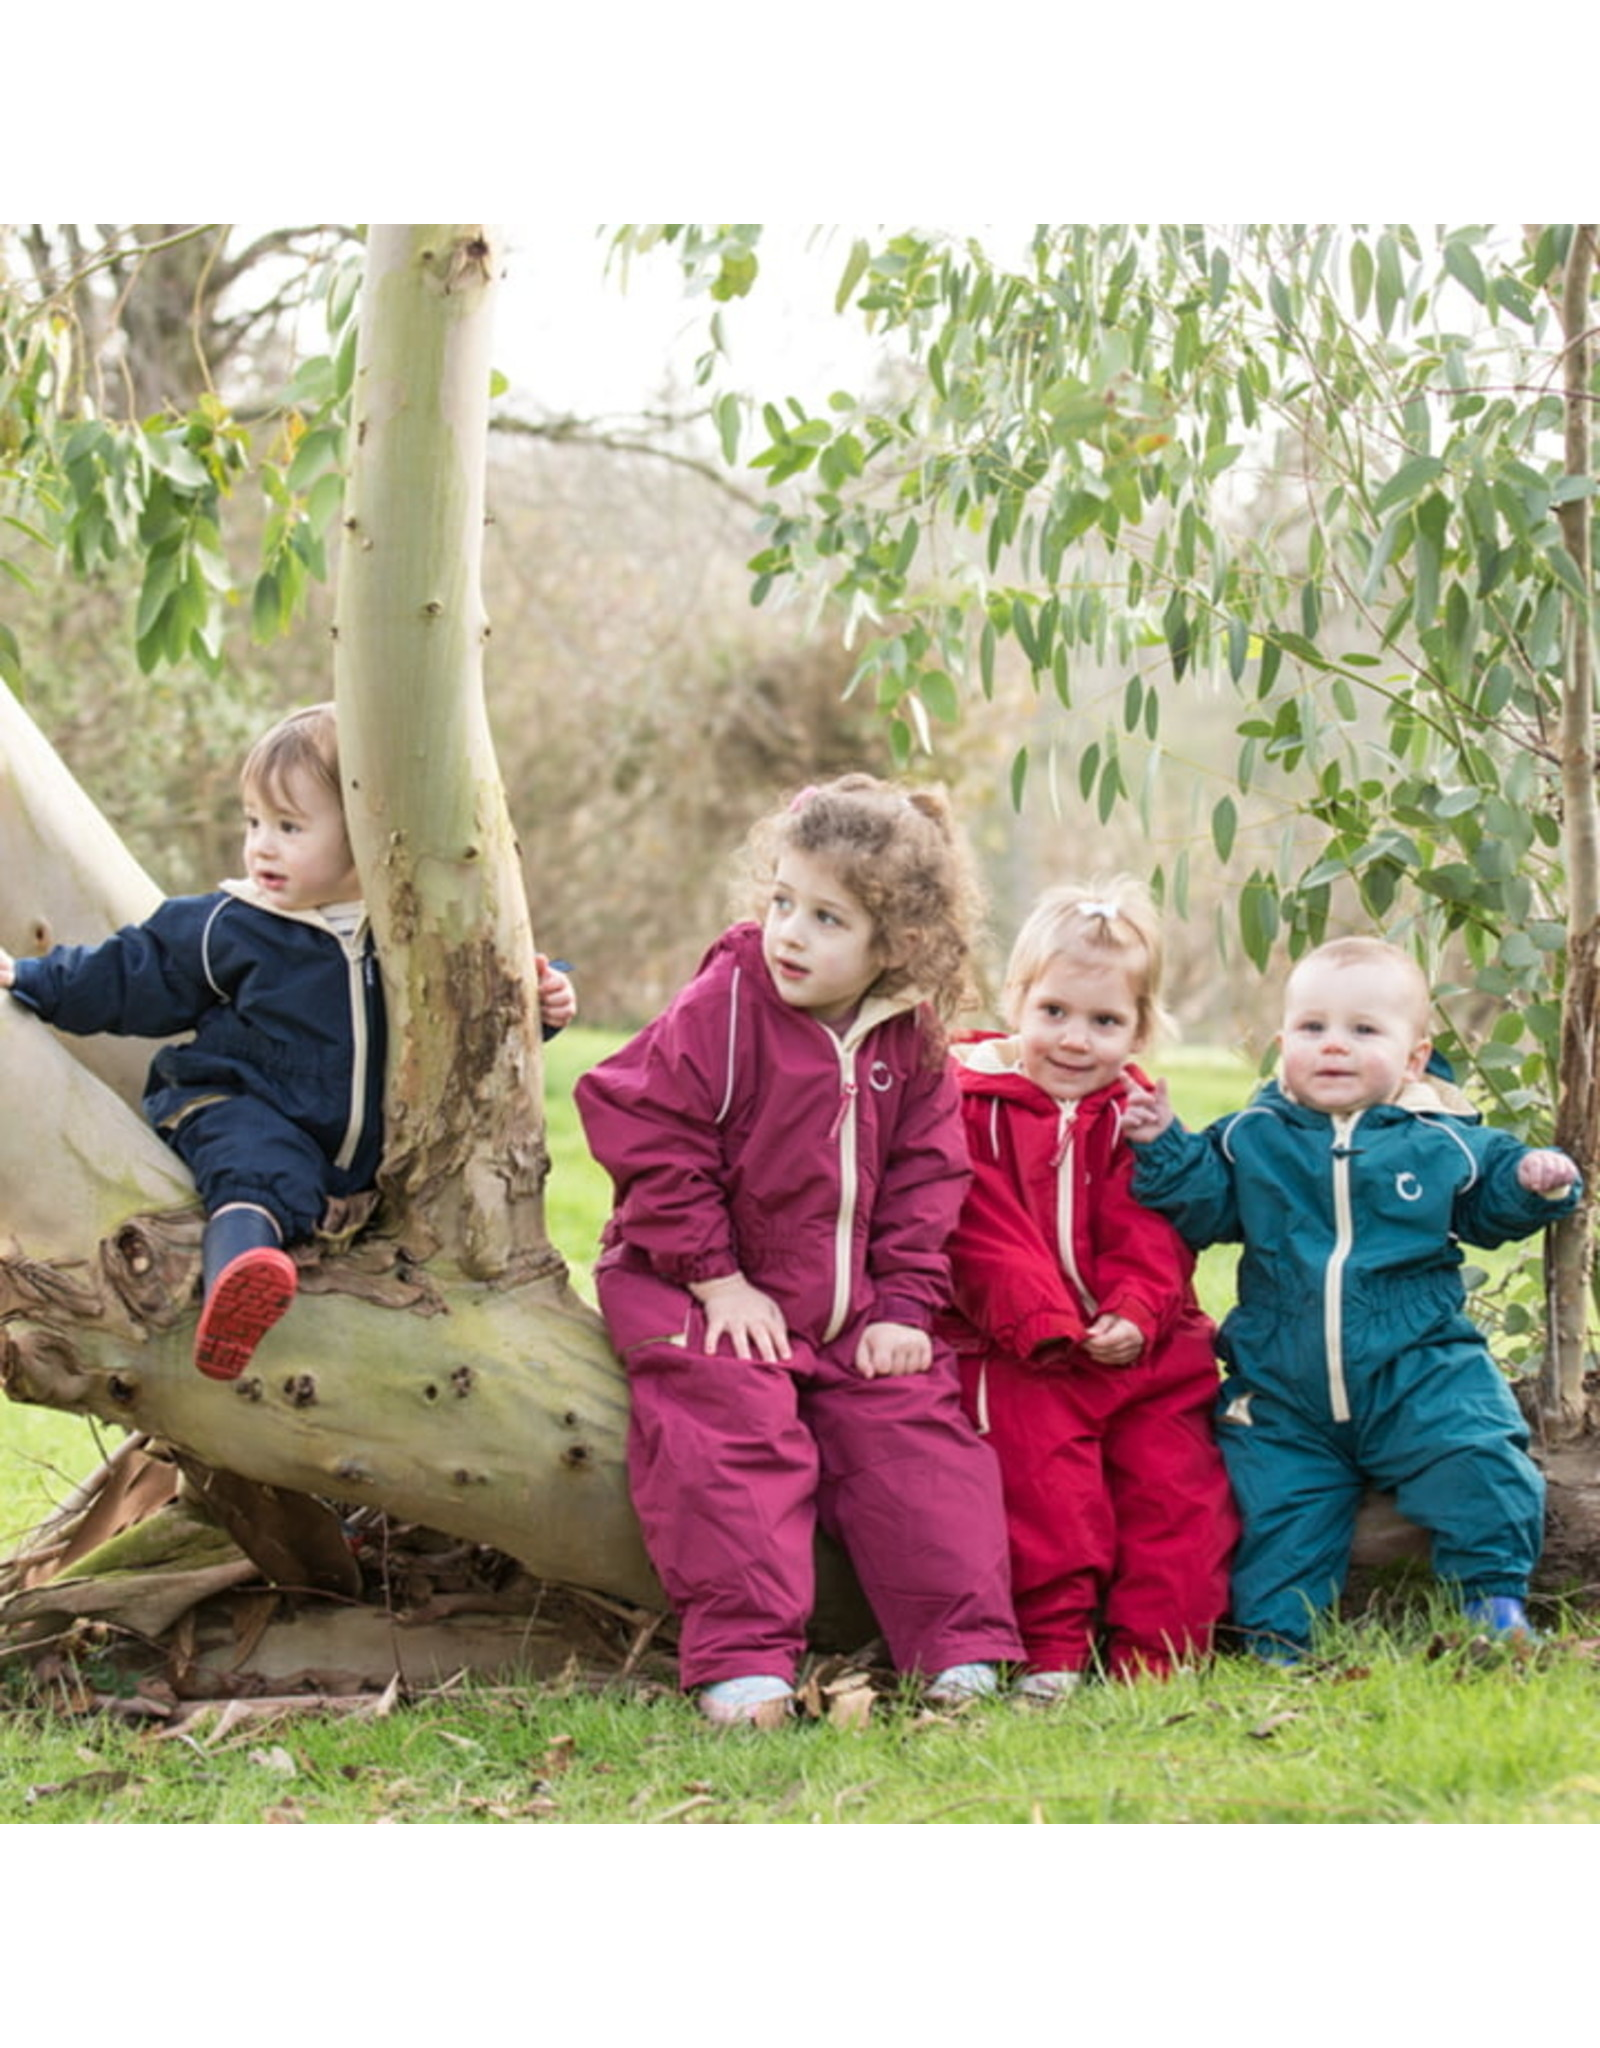 Toddler waterproof Fleece Lined Suit - Raspberry- 18-24 months